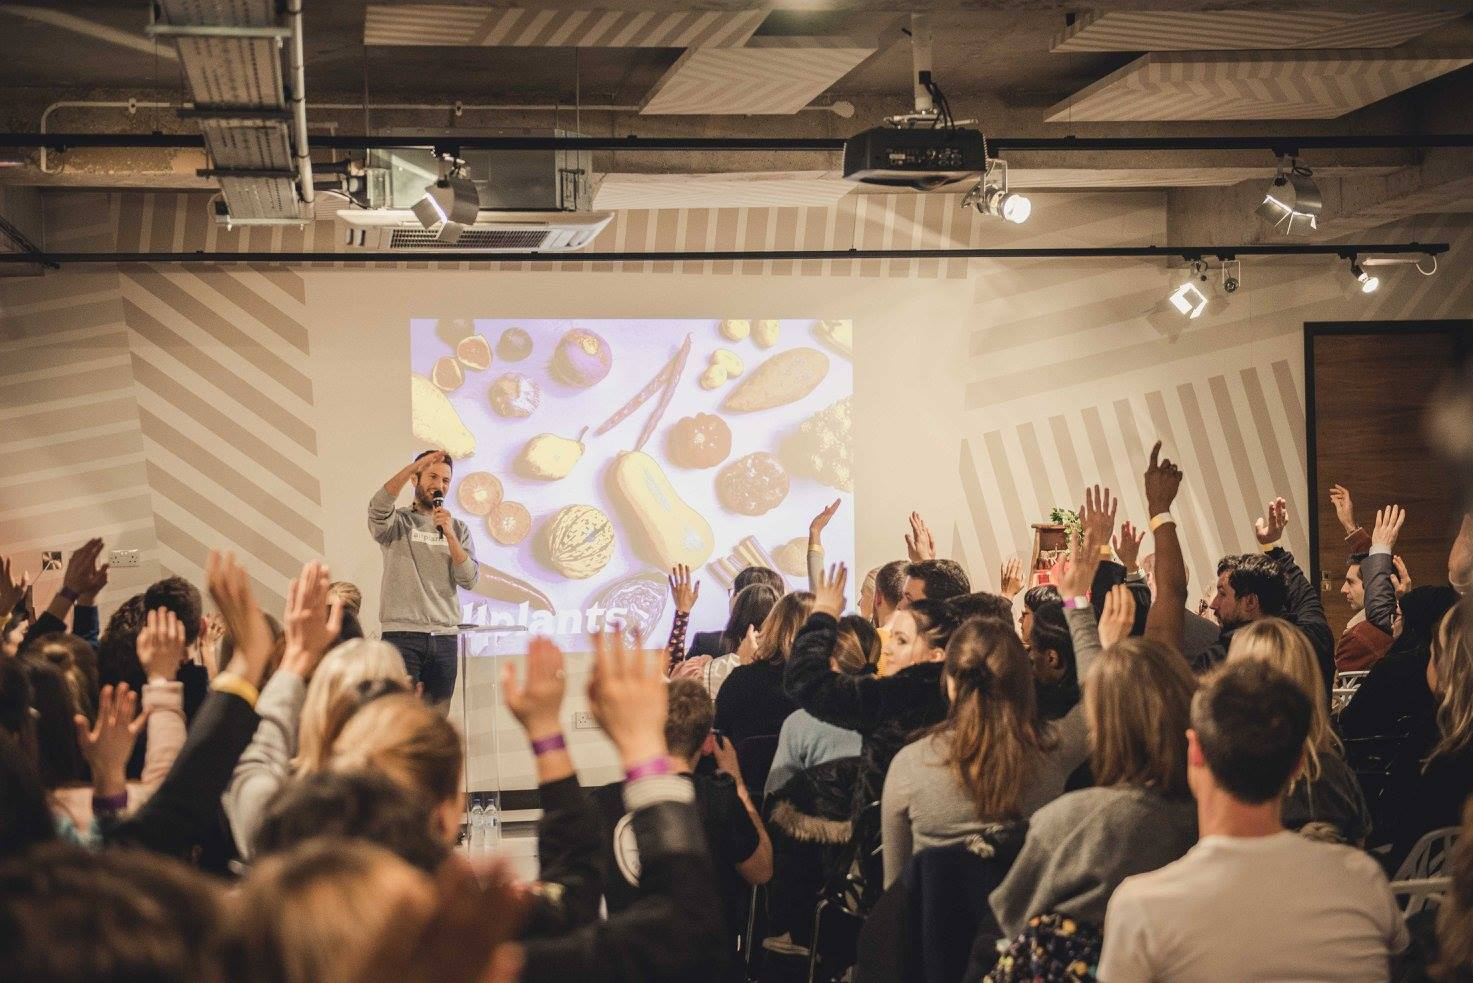 Jonathan Petrides,  allplants  at Vevolution Topics: Food Innovation 2017